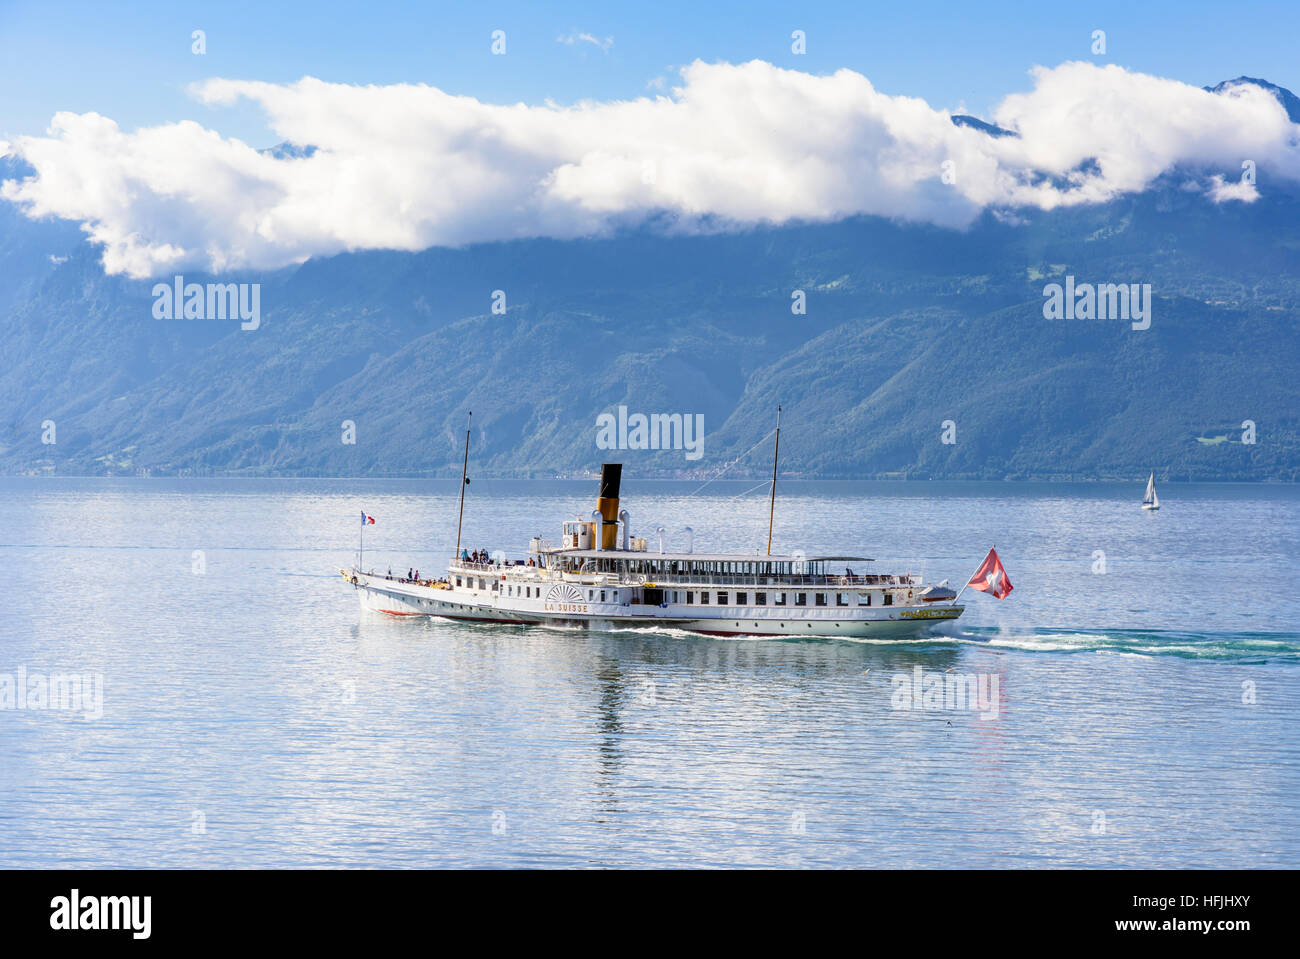 The Belle Epoque paddle steamer La Suisse leaves, Lausanne on Lac Leman, Switzerland Stock Photo